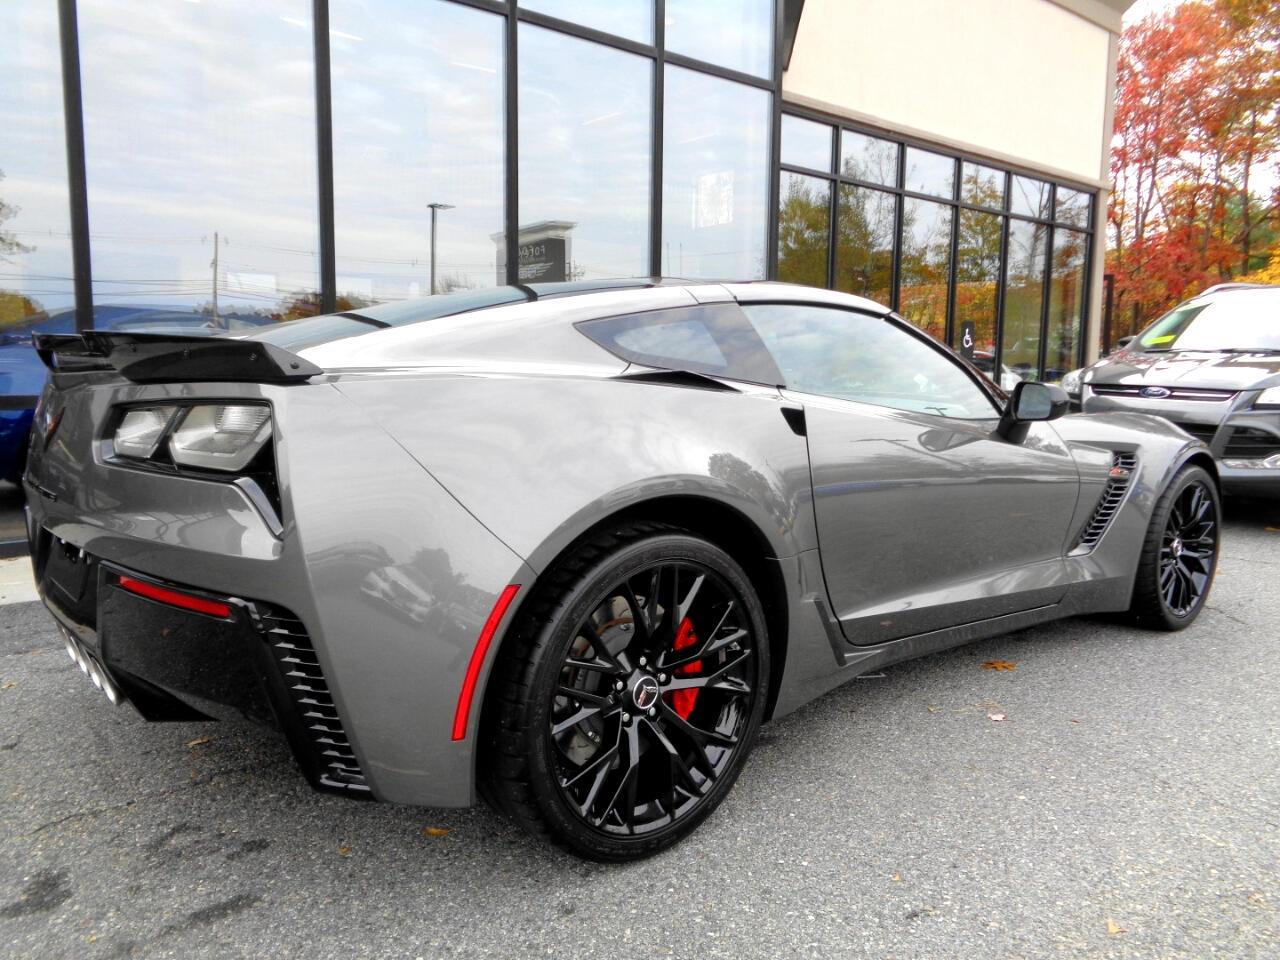 2015 Gray Chevrolet Corvette Z06 3LZ   C7 Corvette Photo 4